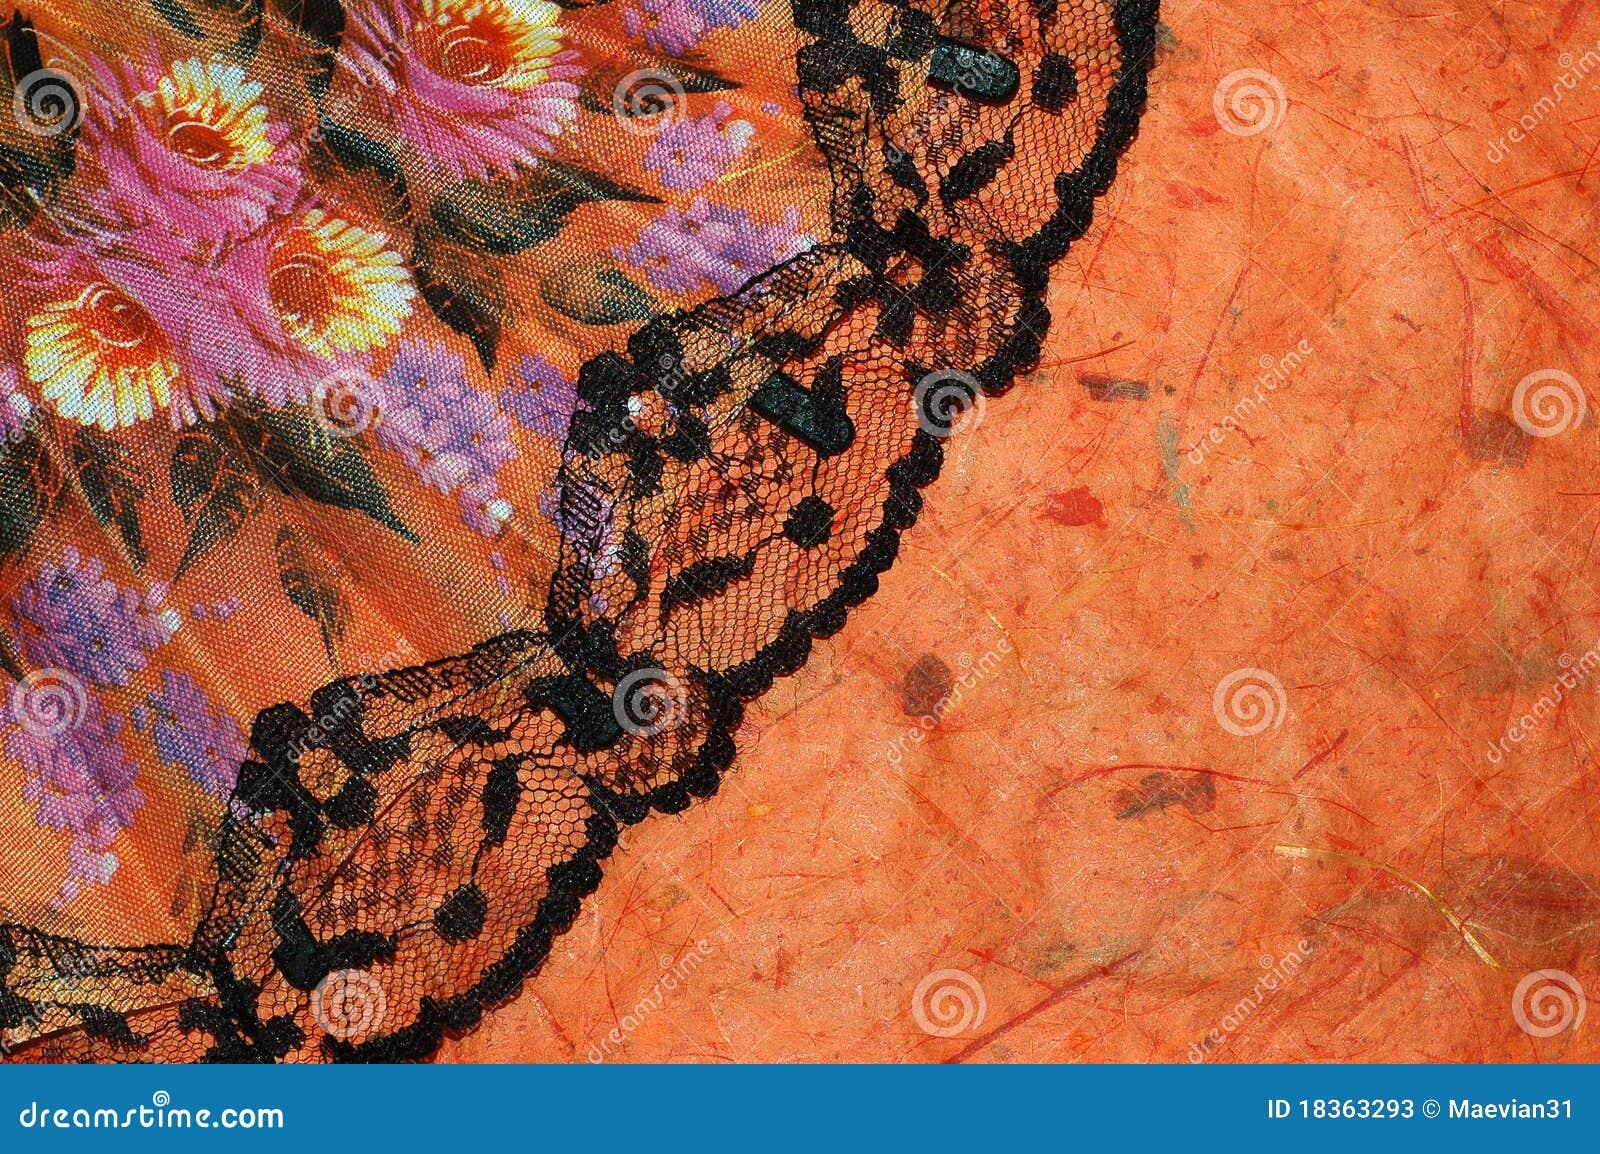 orange background with a spanish fan stock image